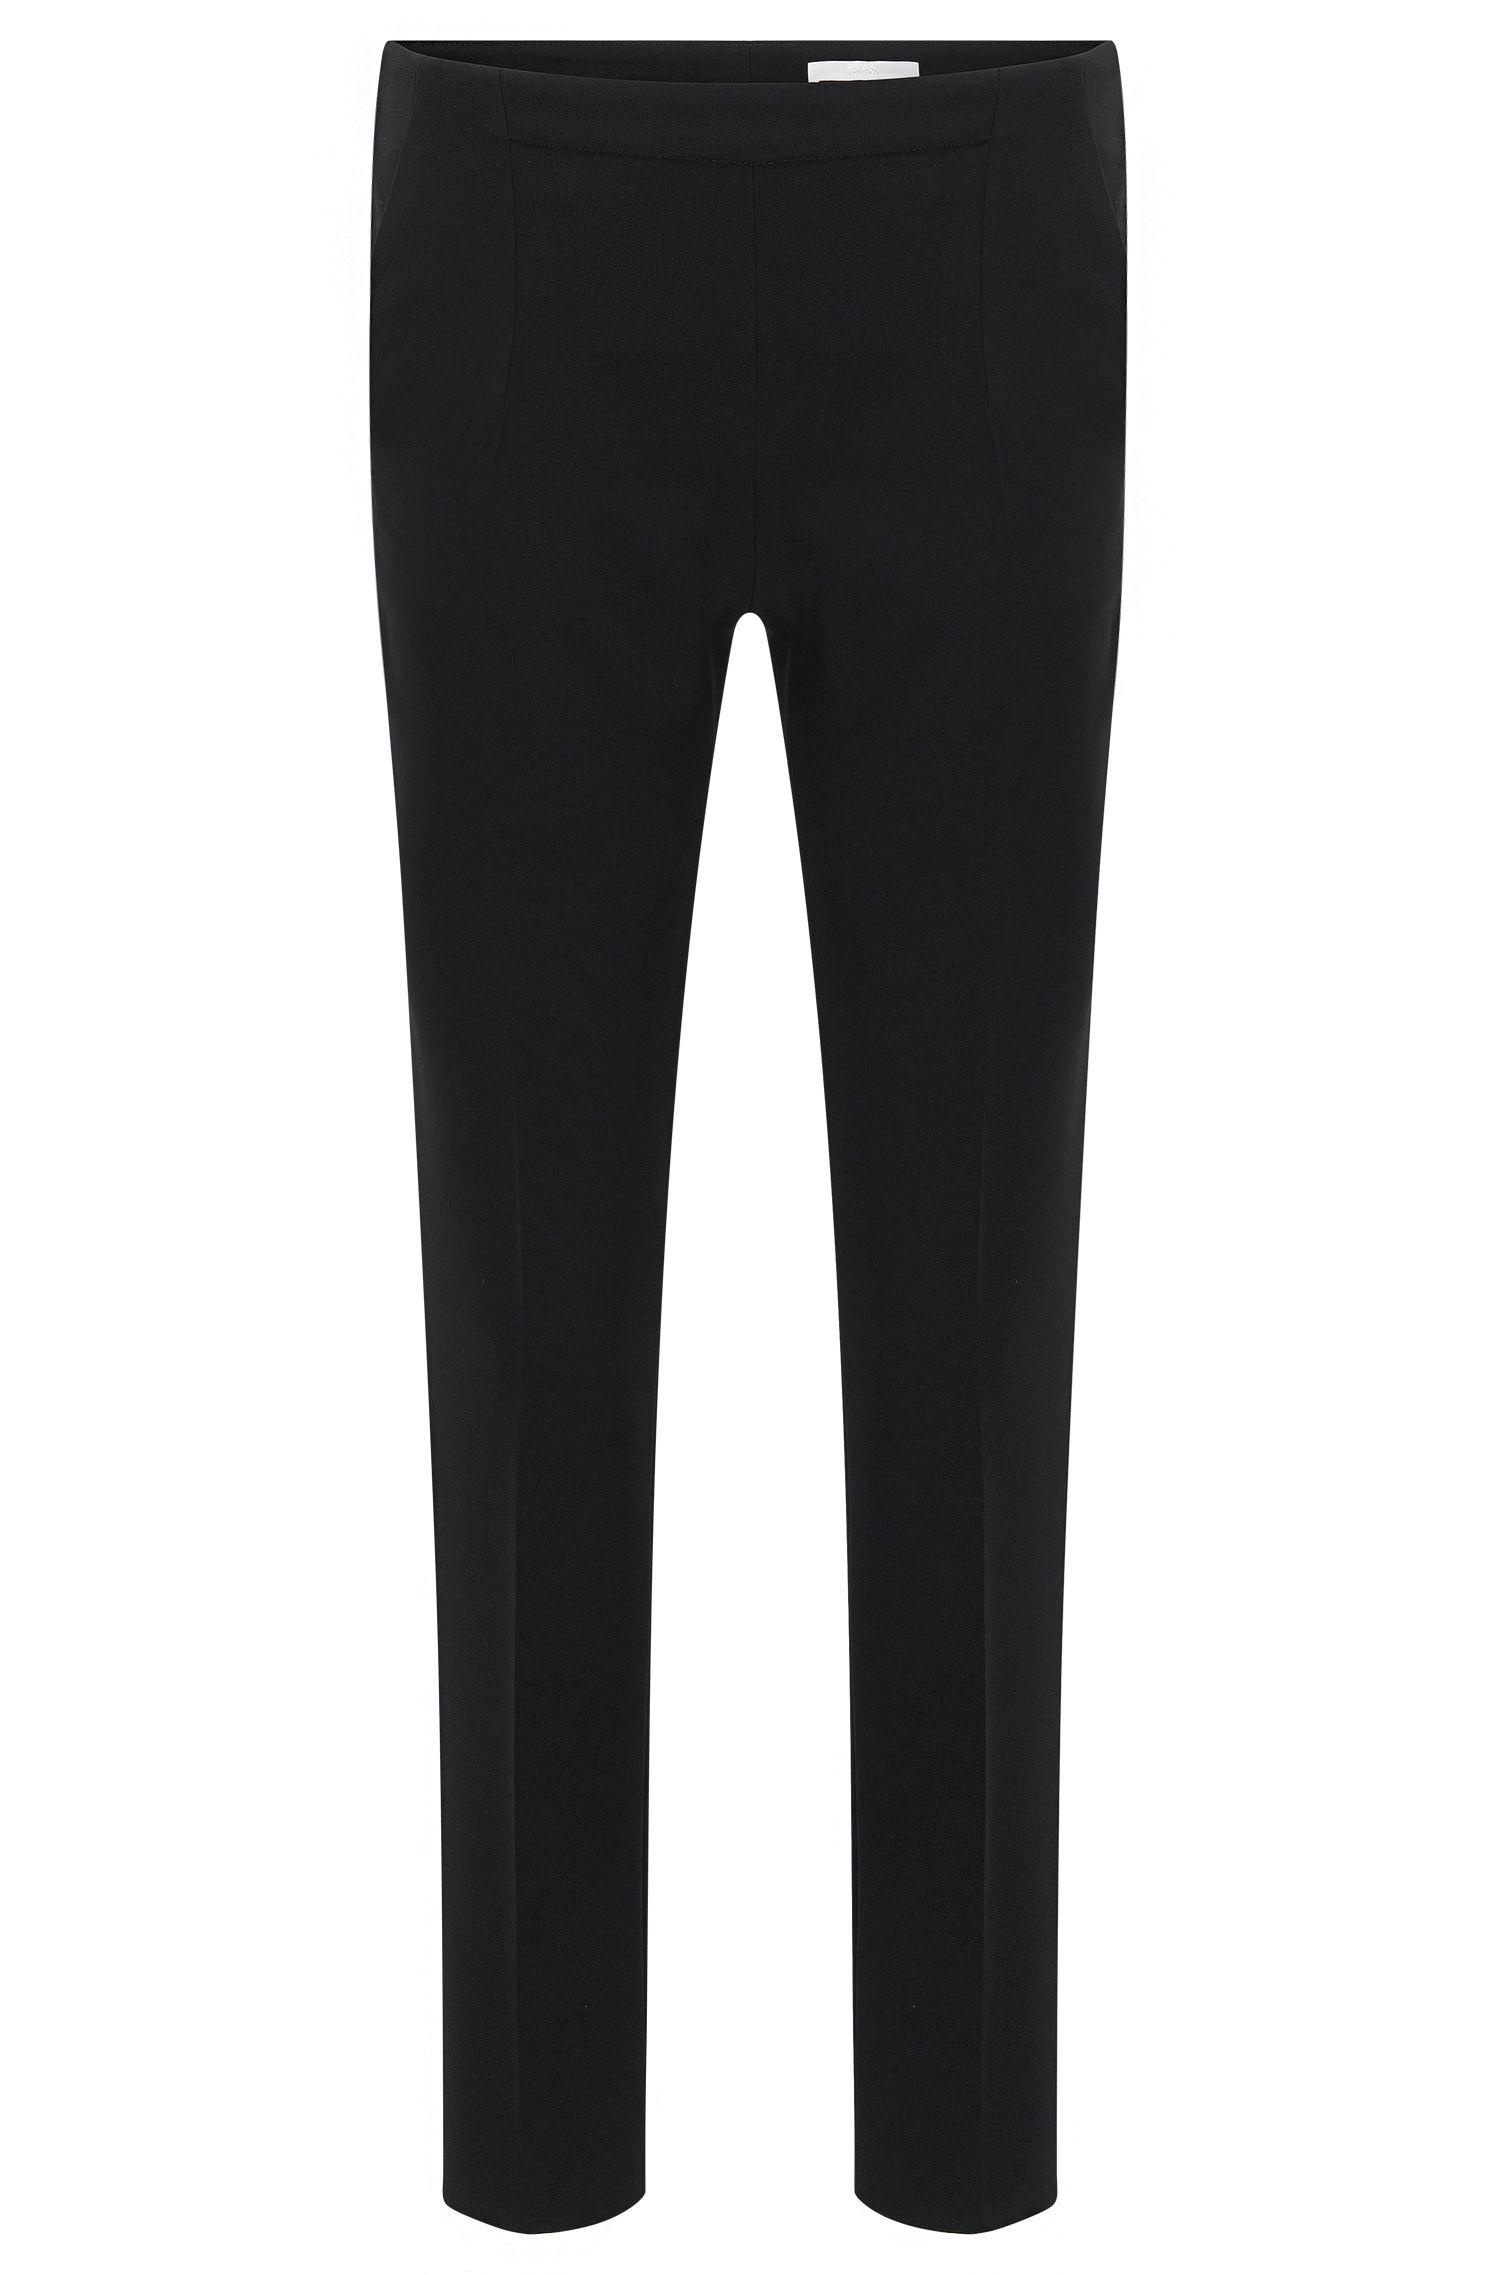 'Tilunisa Sidezip' | Crepe Crop Pants